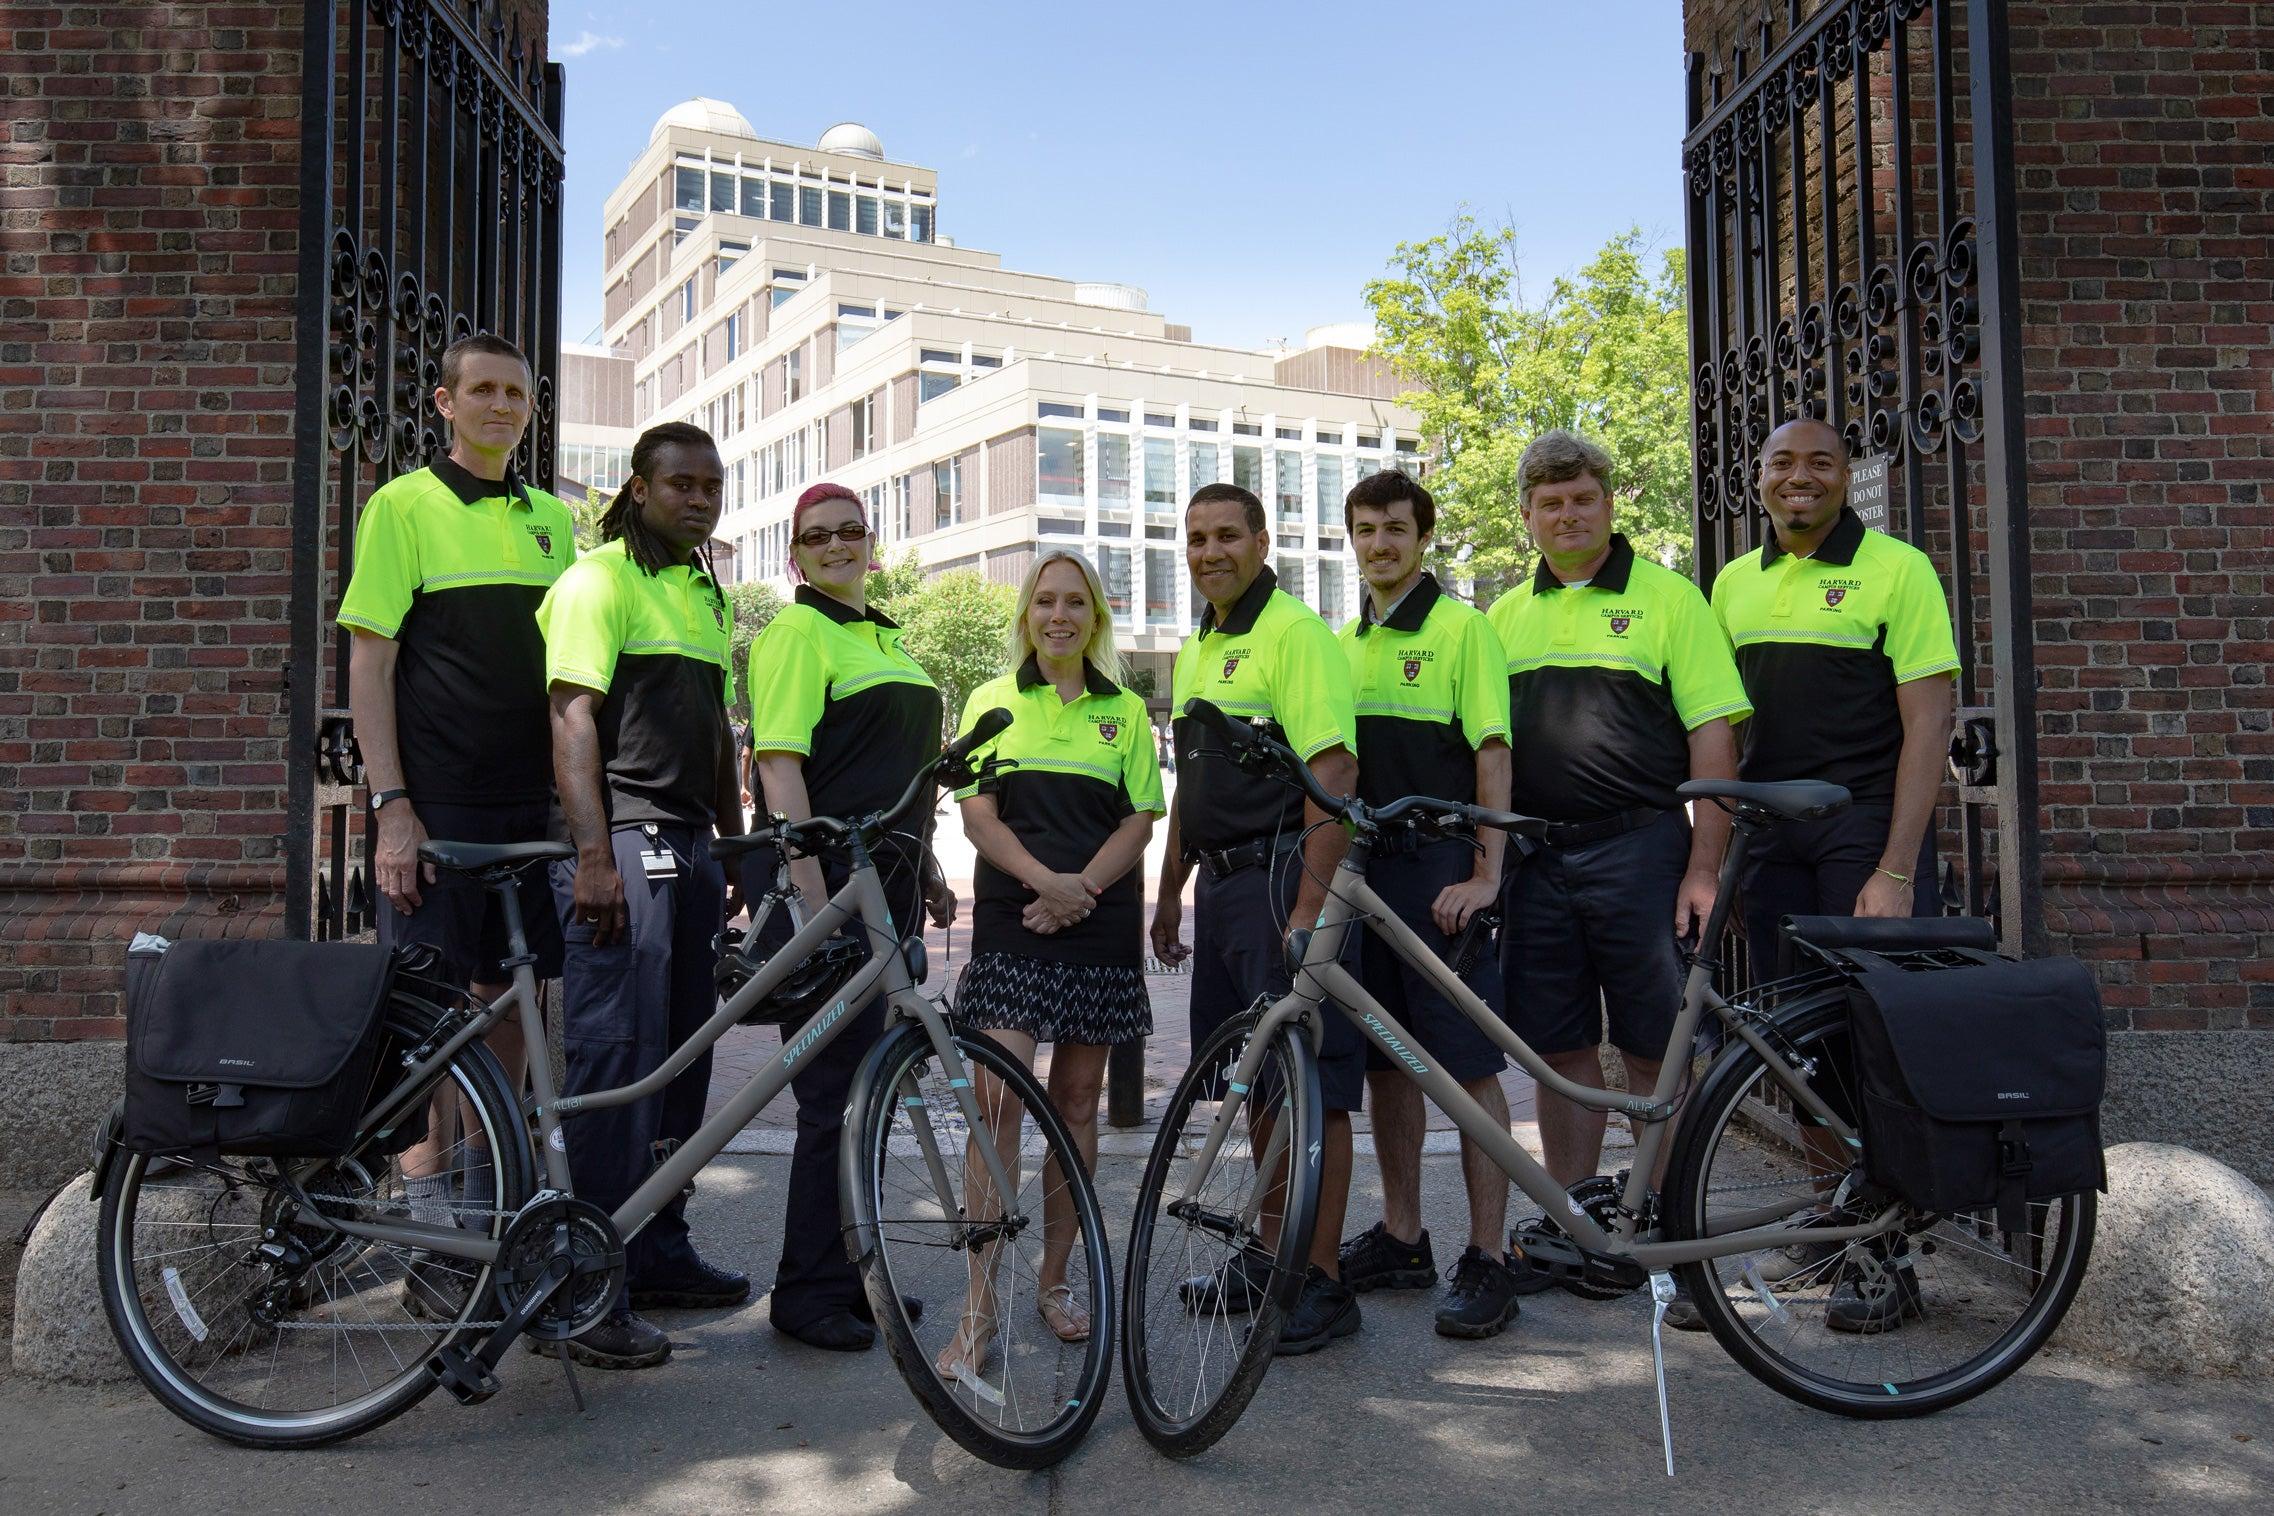 Harvard's parking monitors can now patrol campus via bicycles.